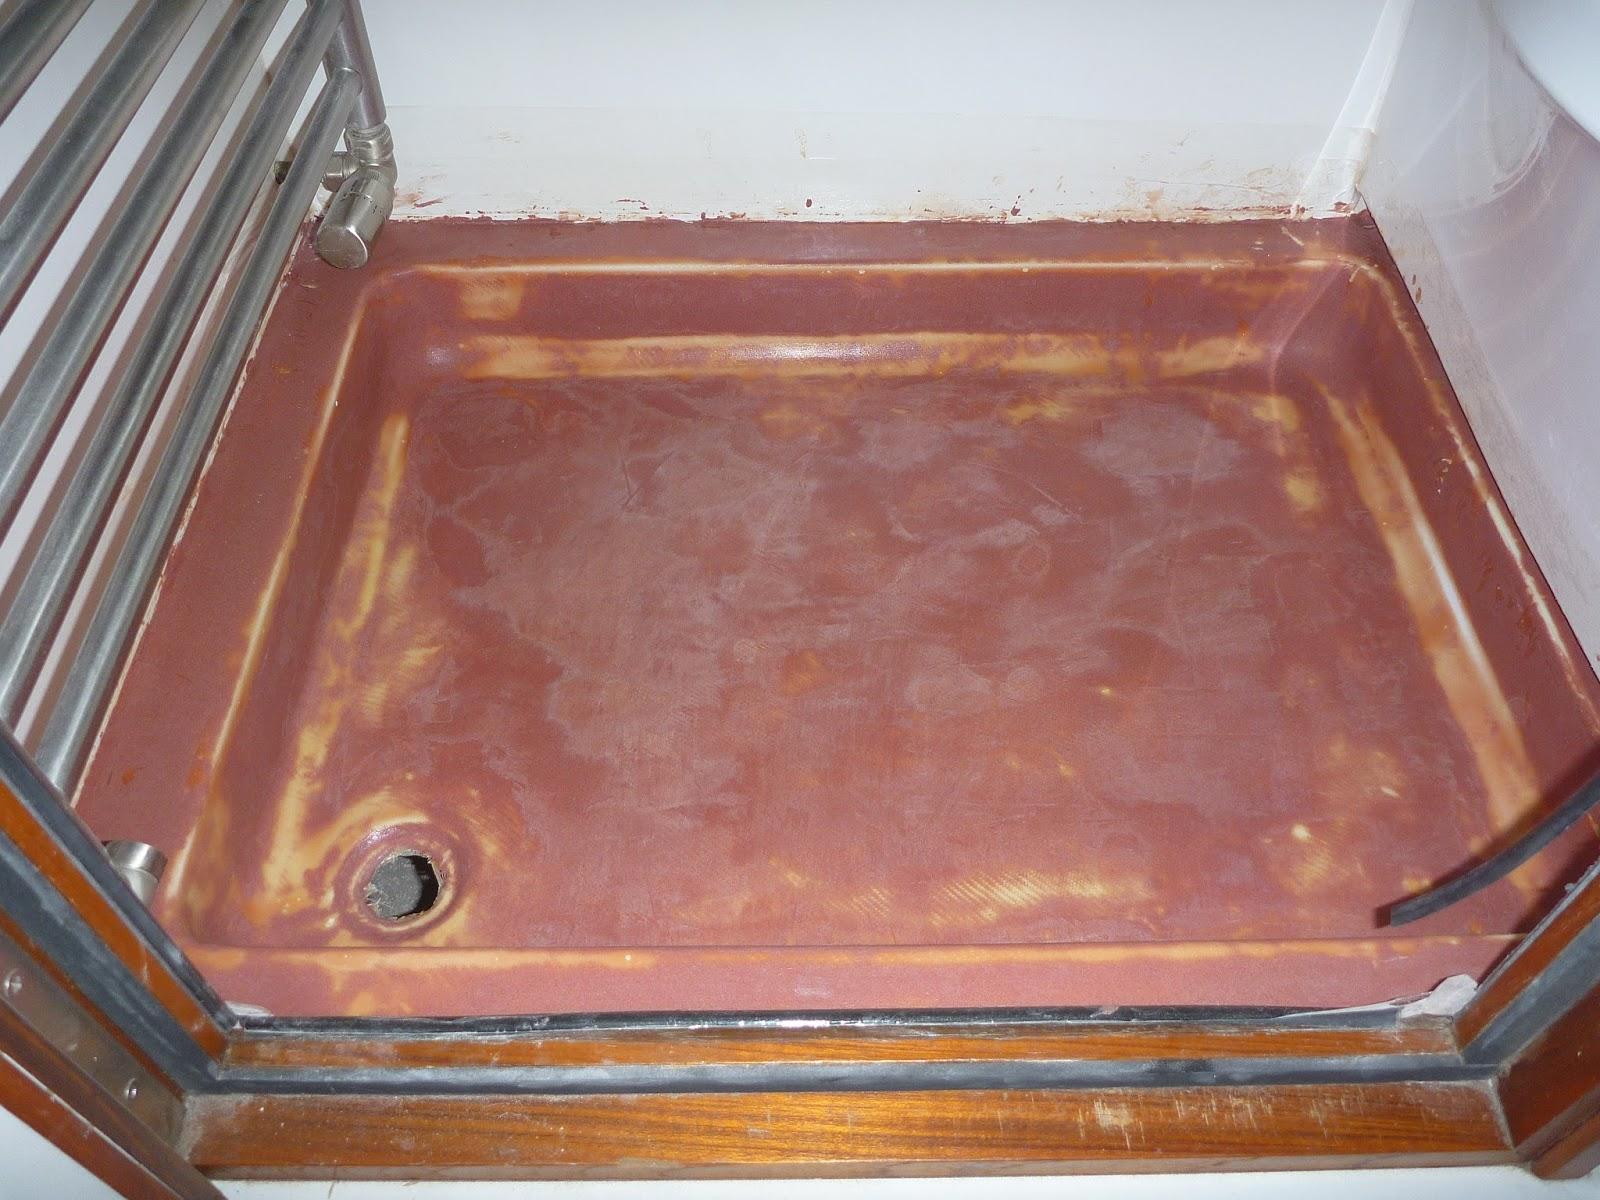 Old Fashioned Fibreglass Shower Bases Photo - Luxurious Bathtub ...